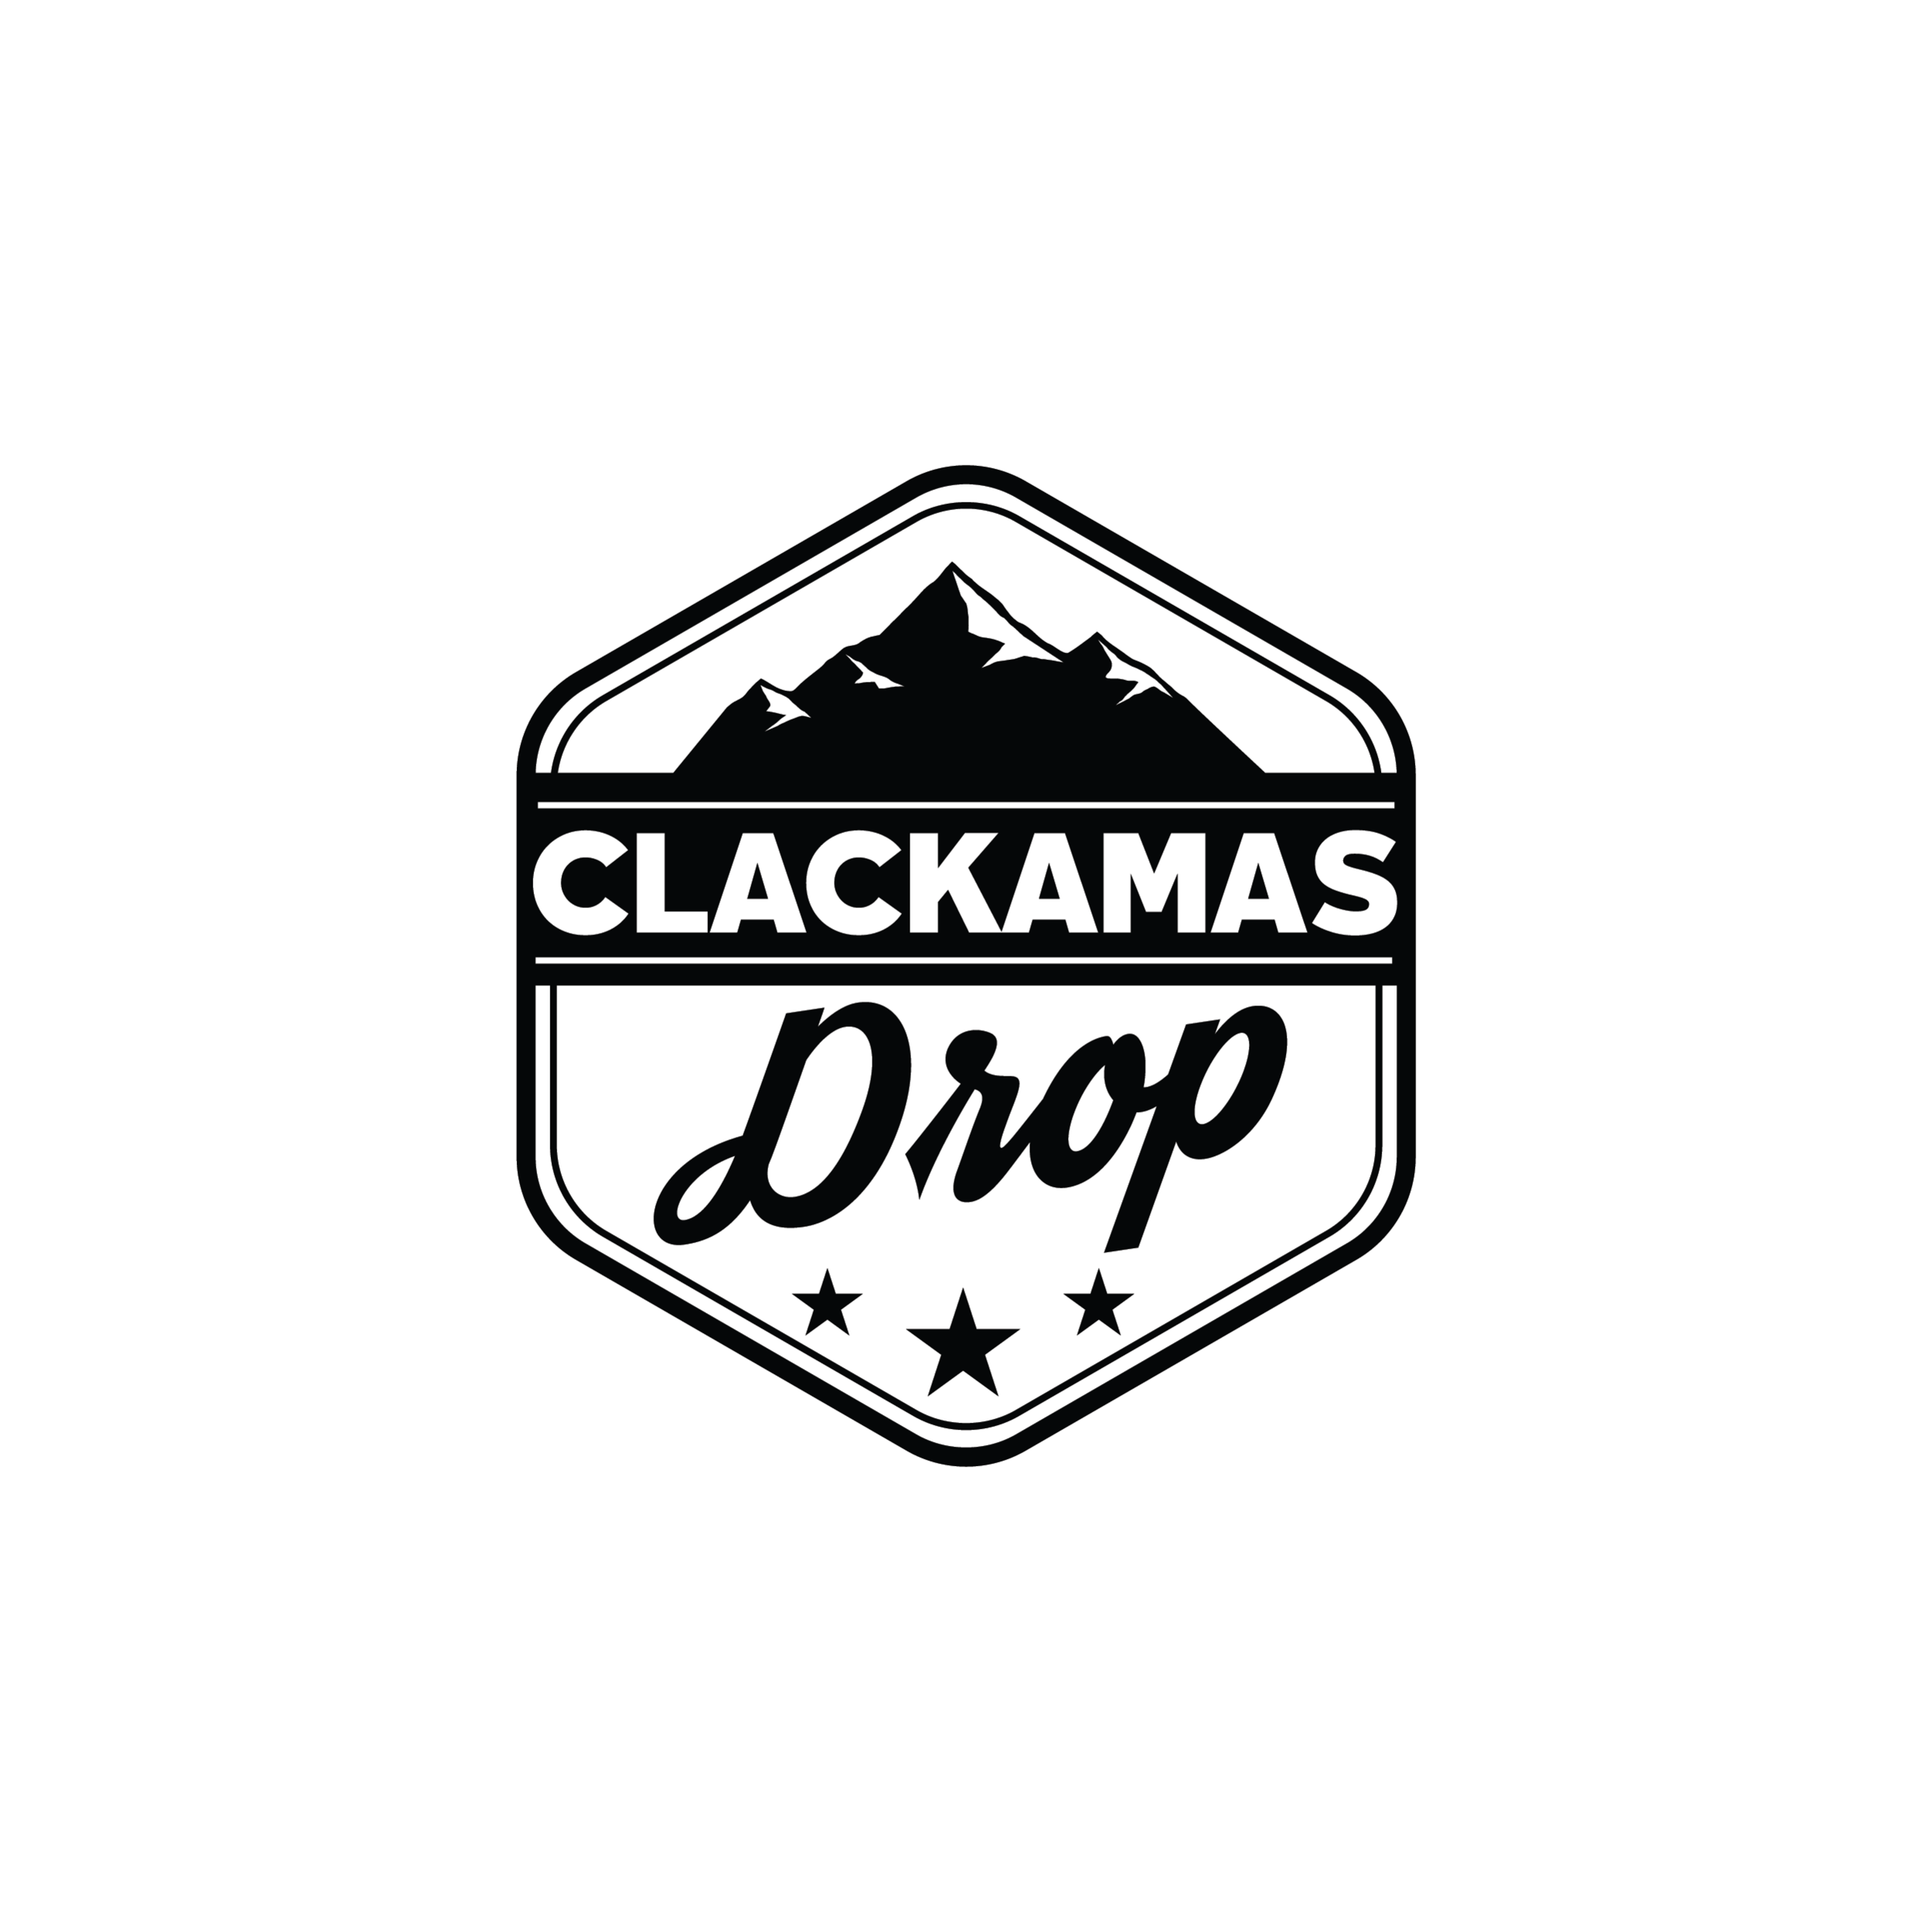 1 Clackamas Drop.png